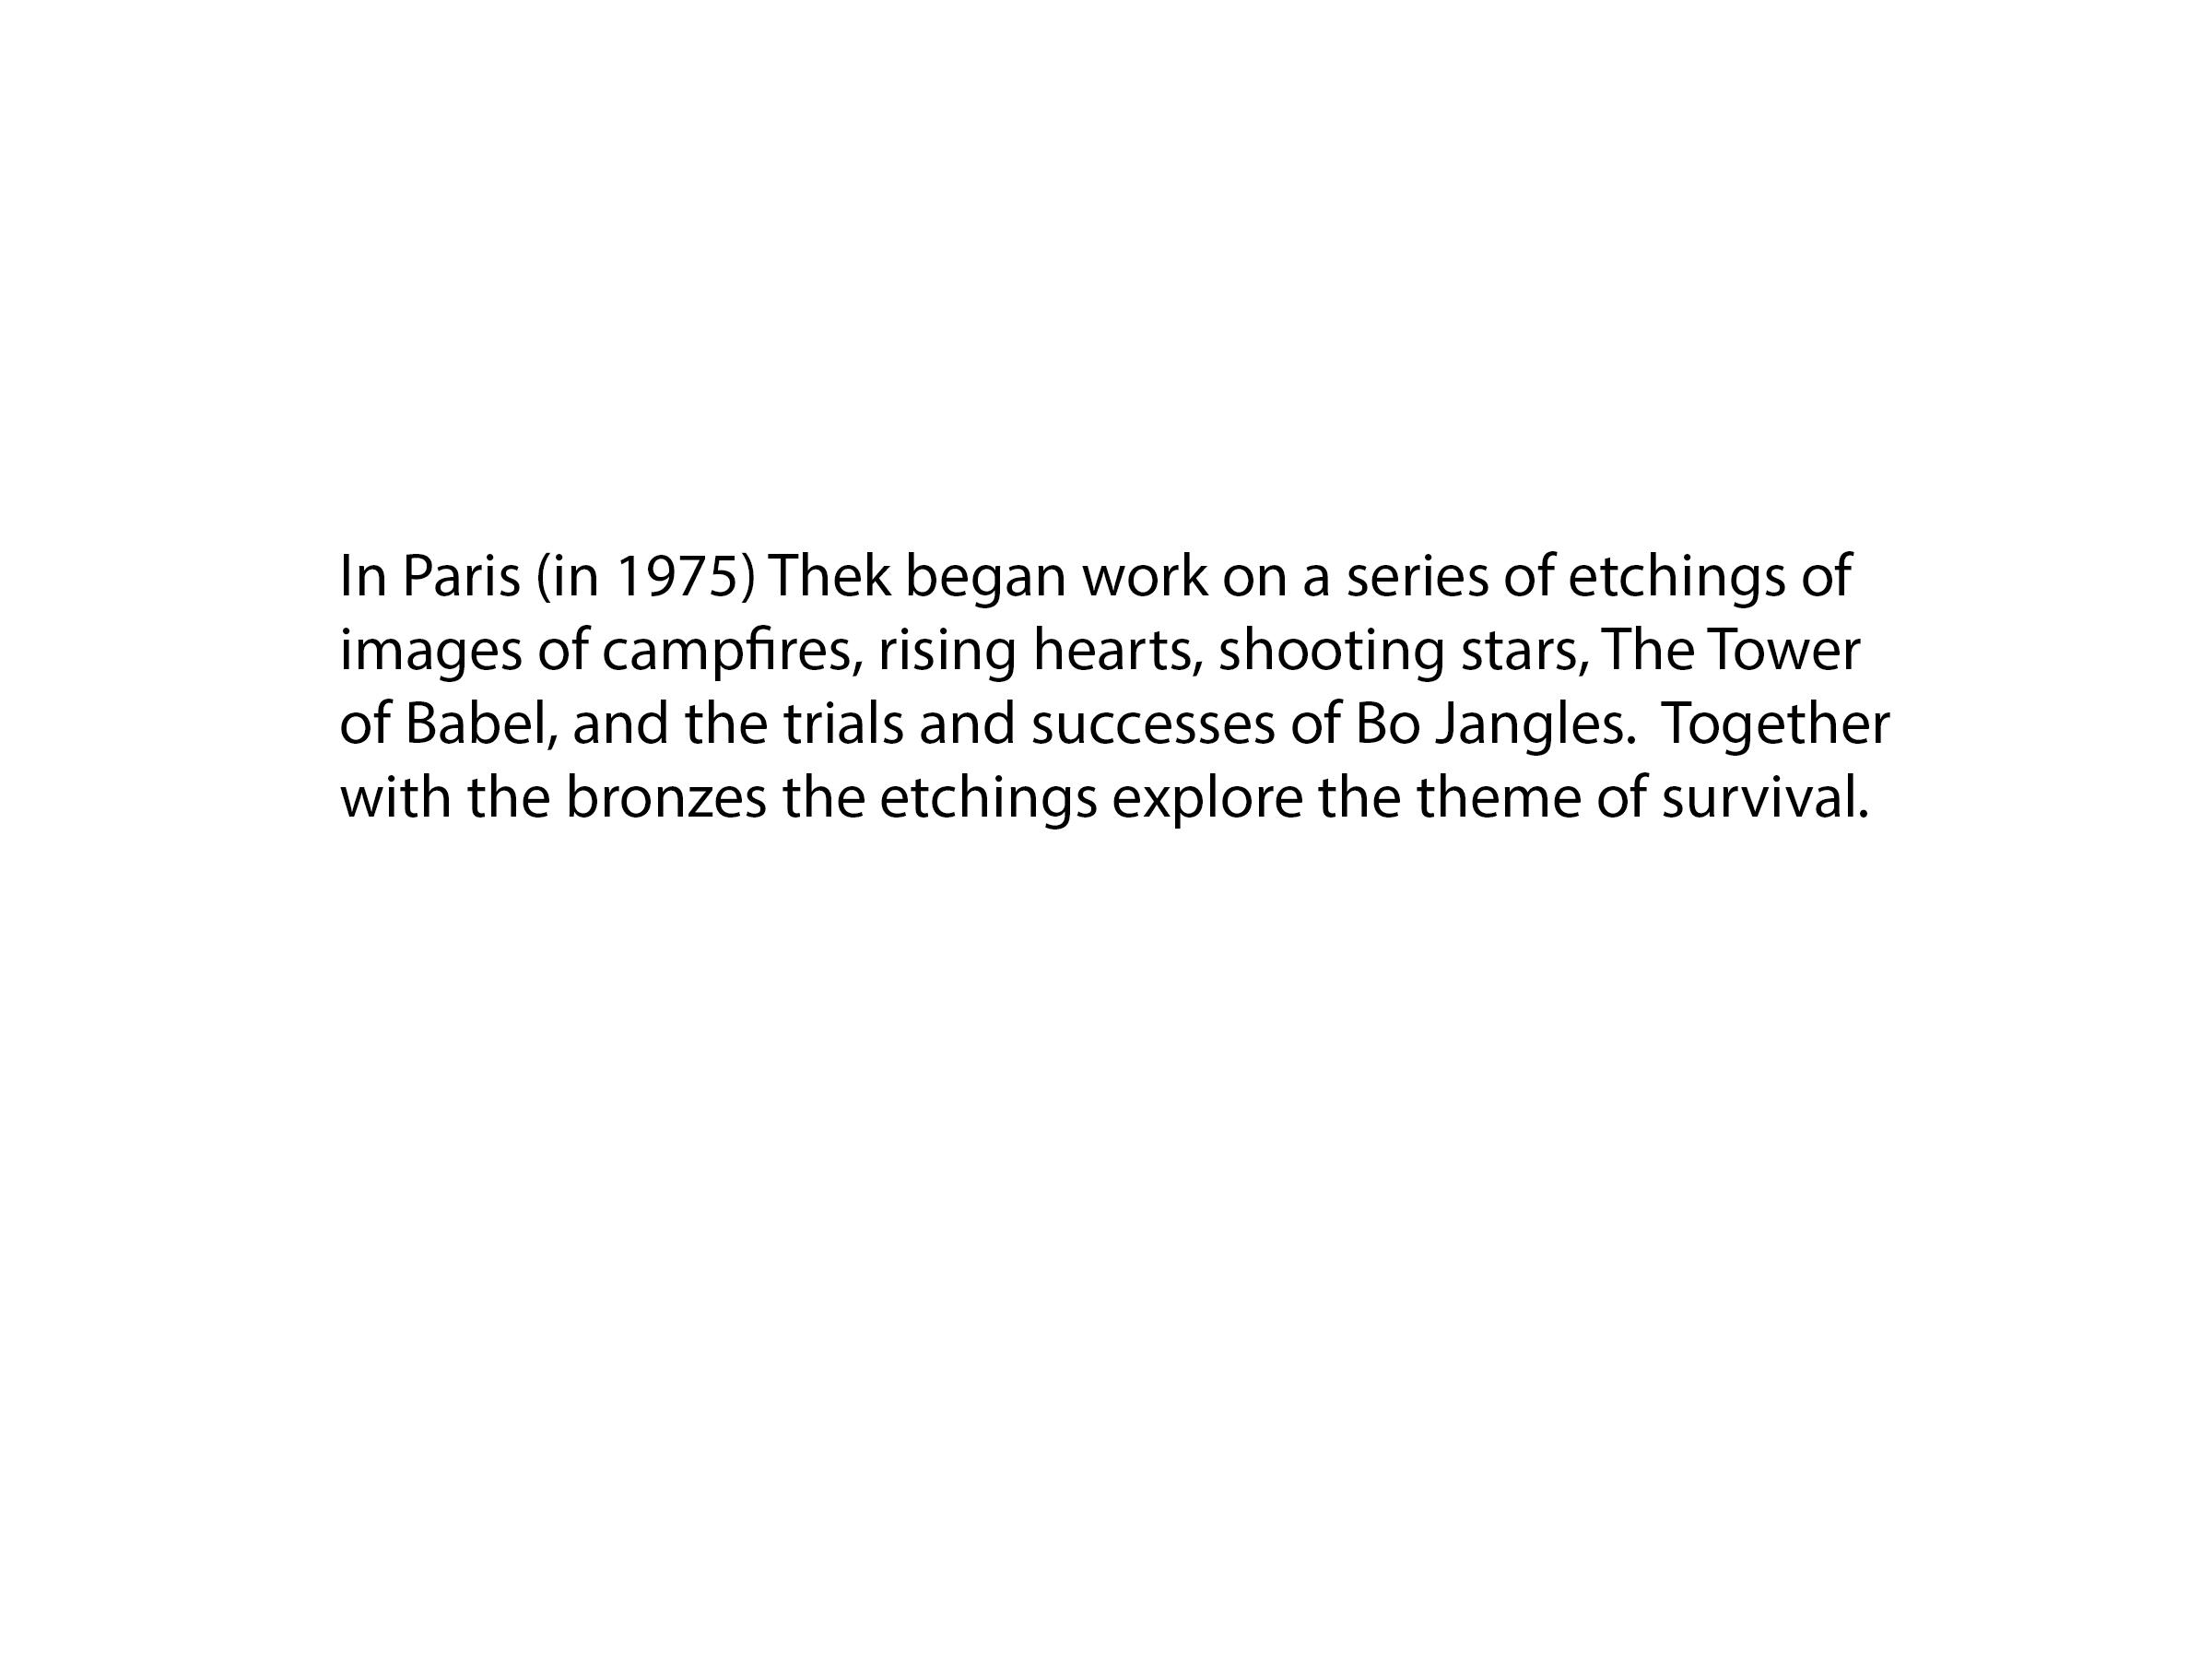 Paul Thek text